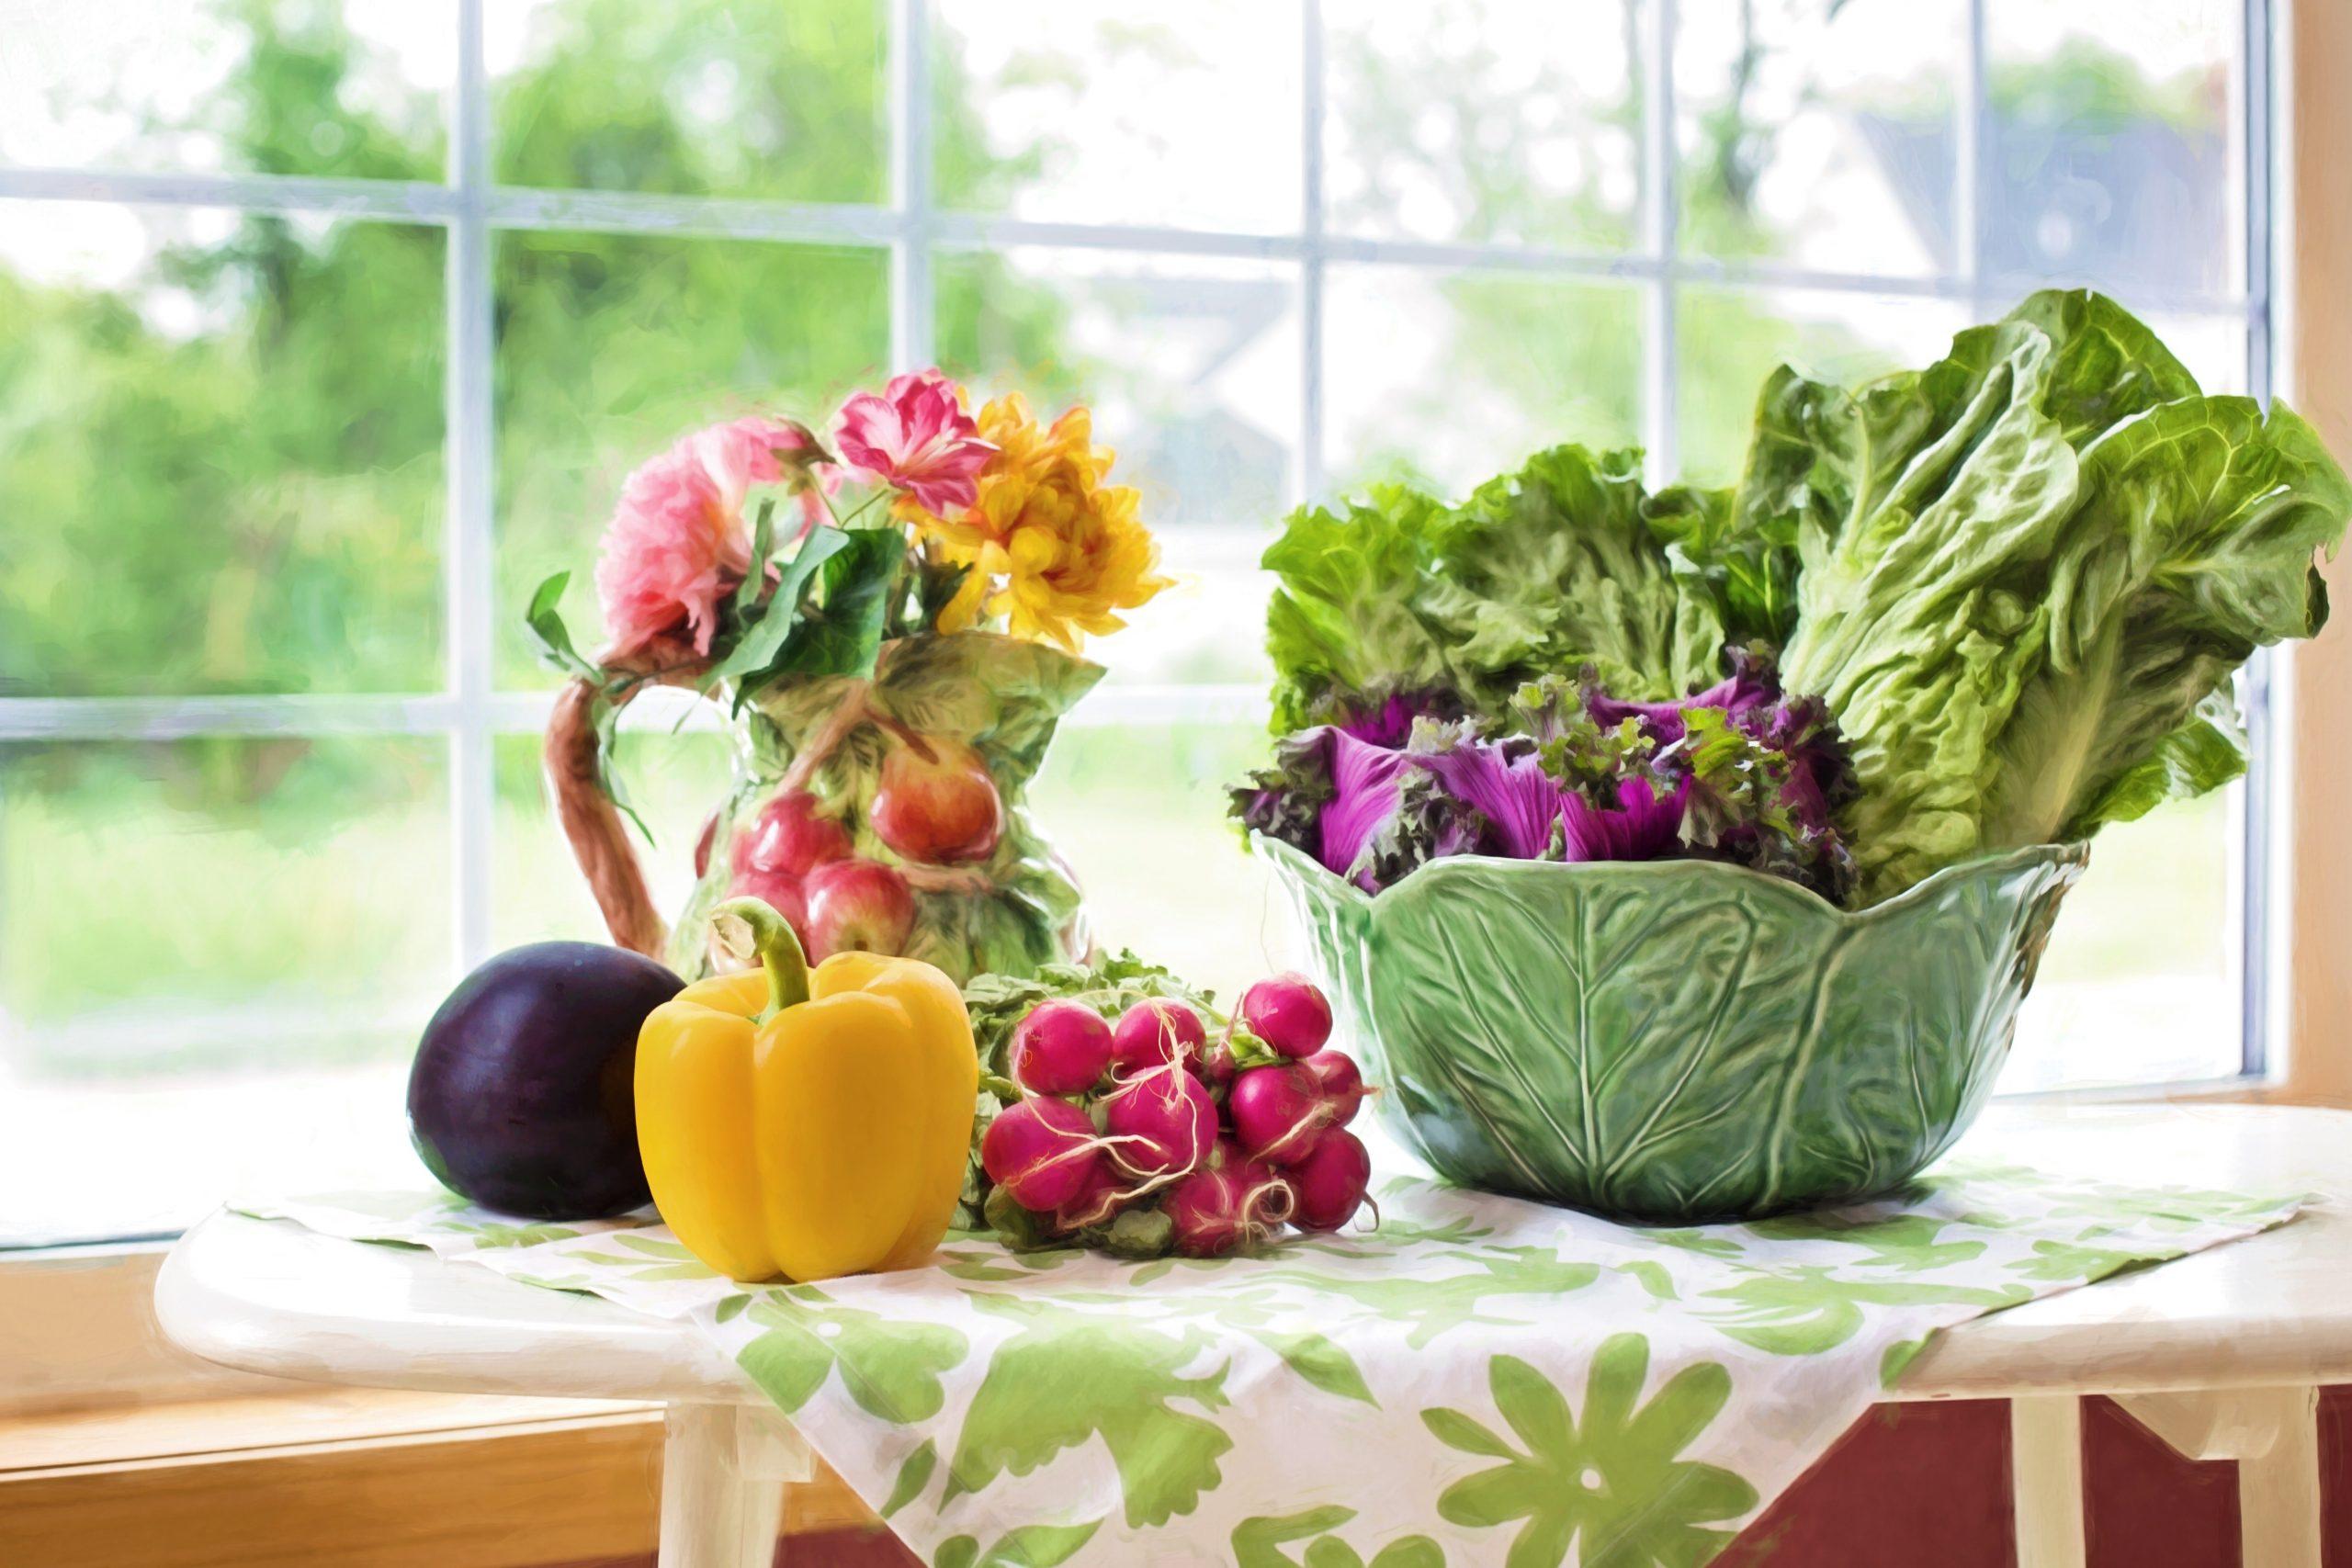 fresh produce on kitchen table